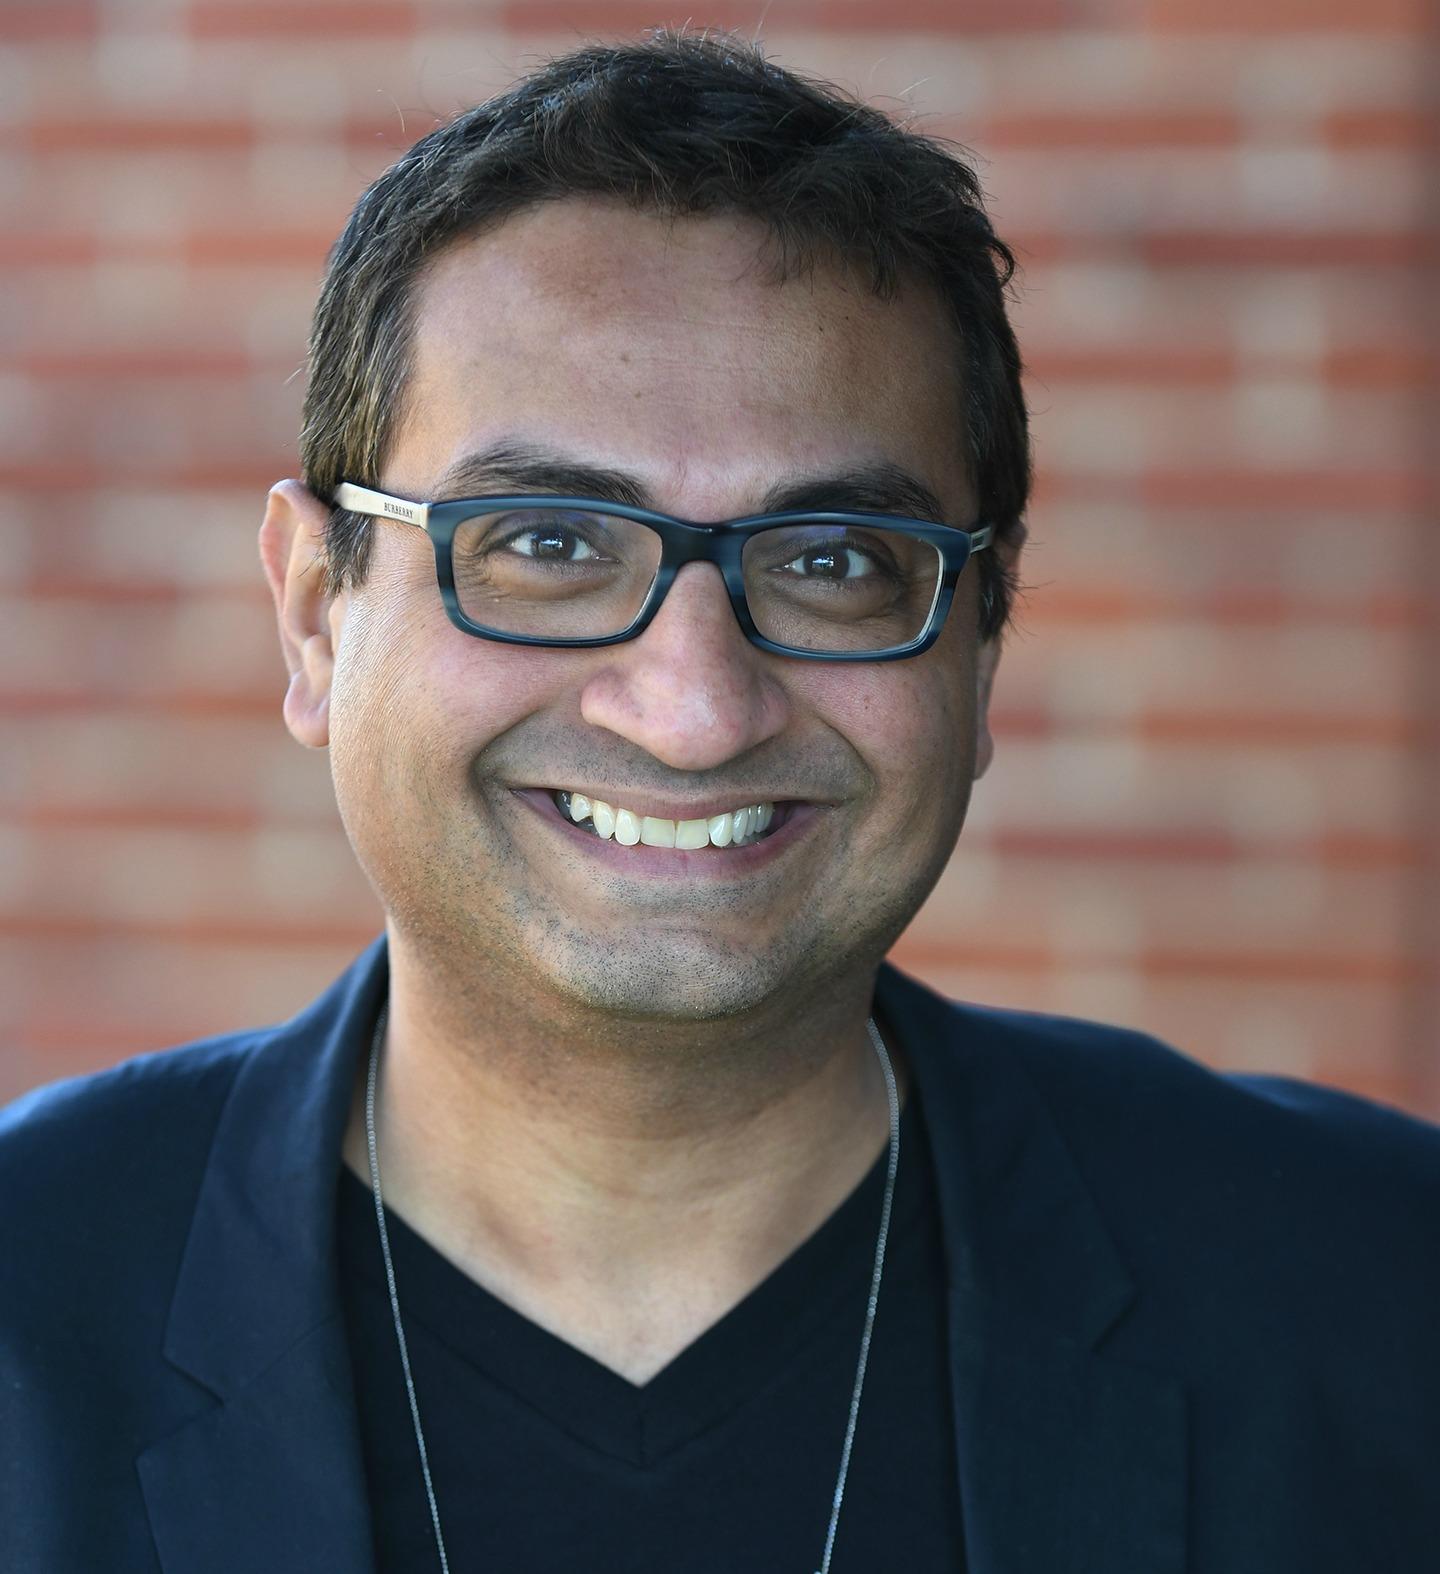 Jitin Hingorani Founder and Festival Director for the Soutehast Asian Film FEstival.